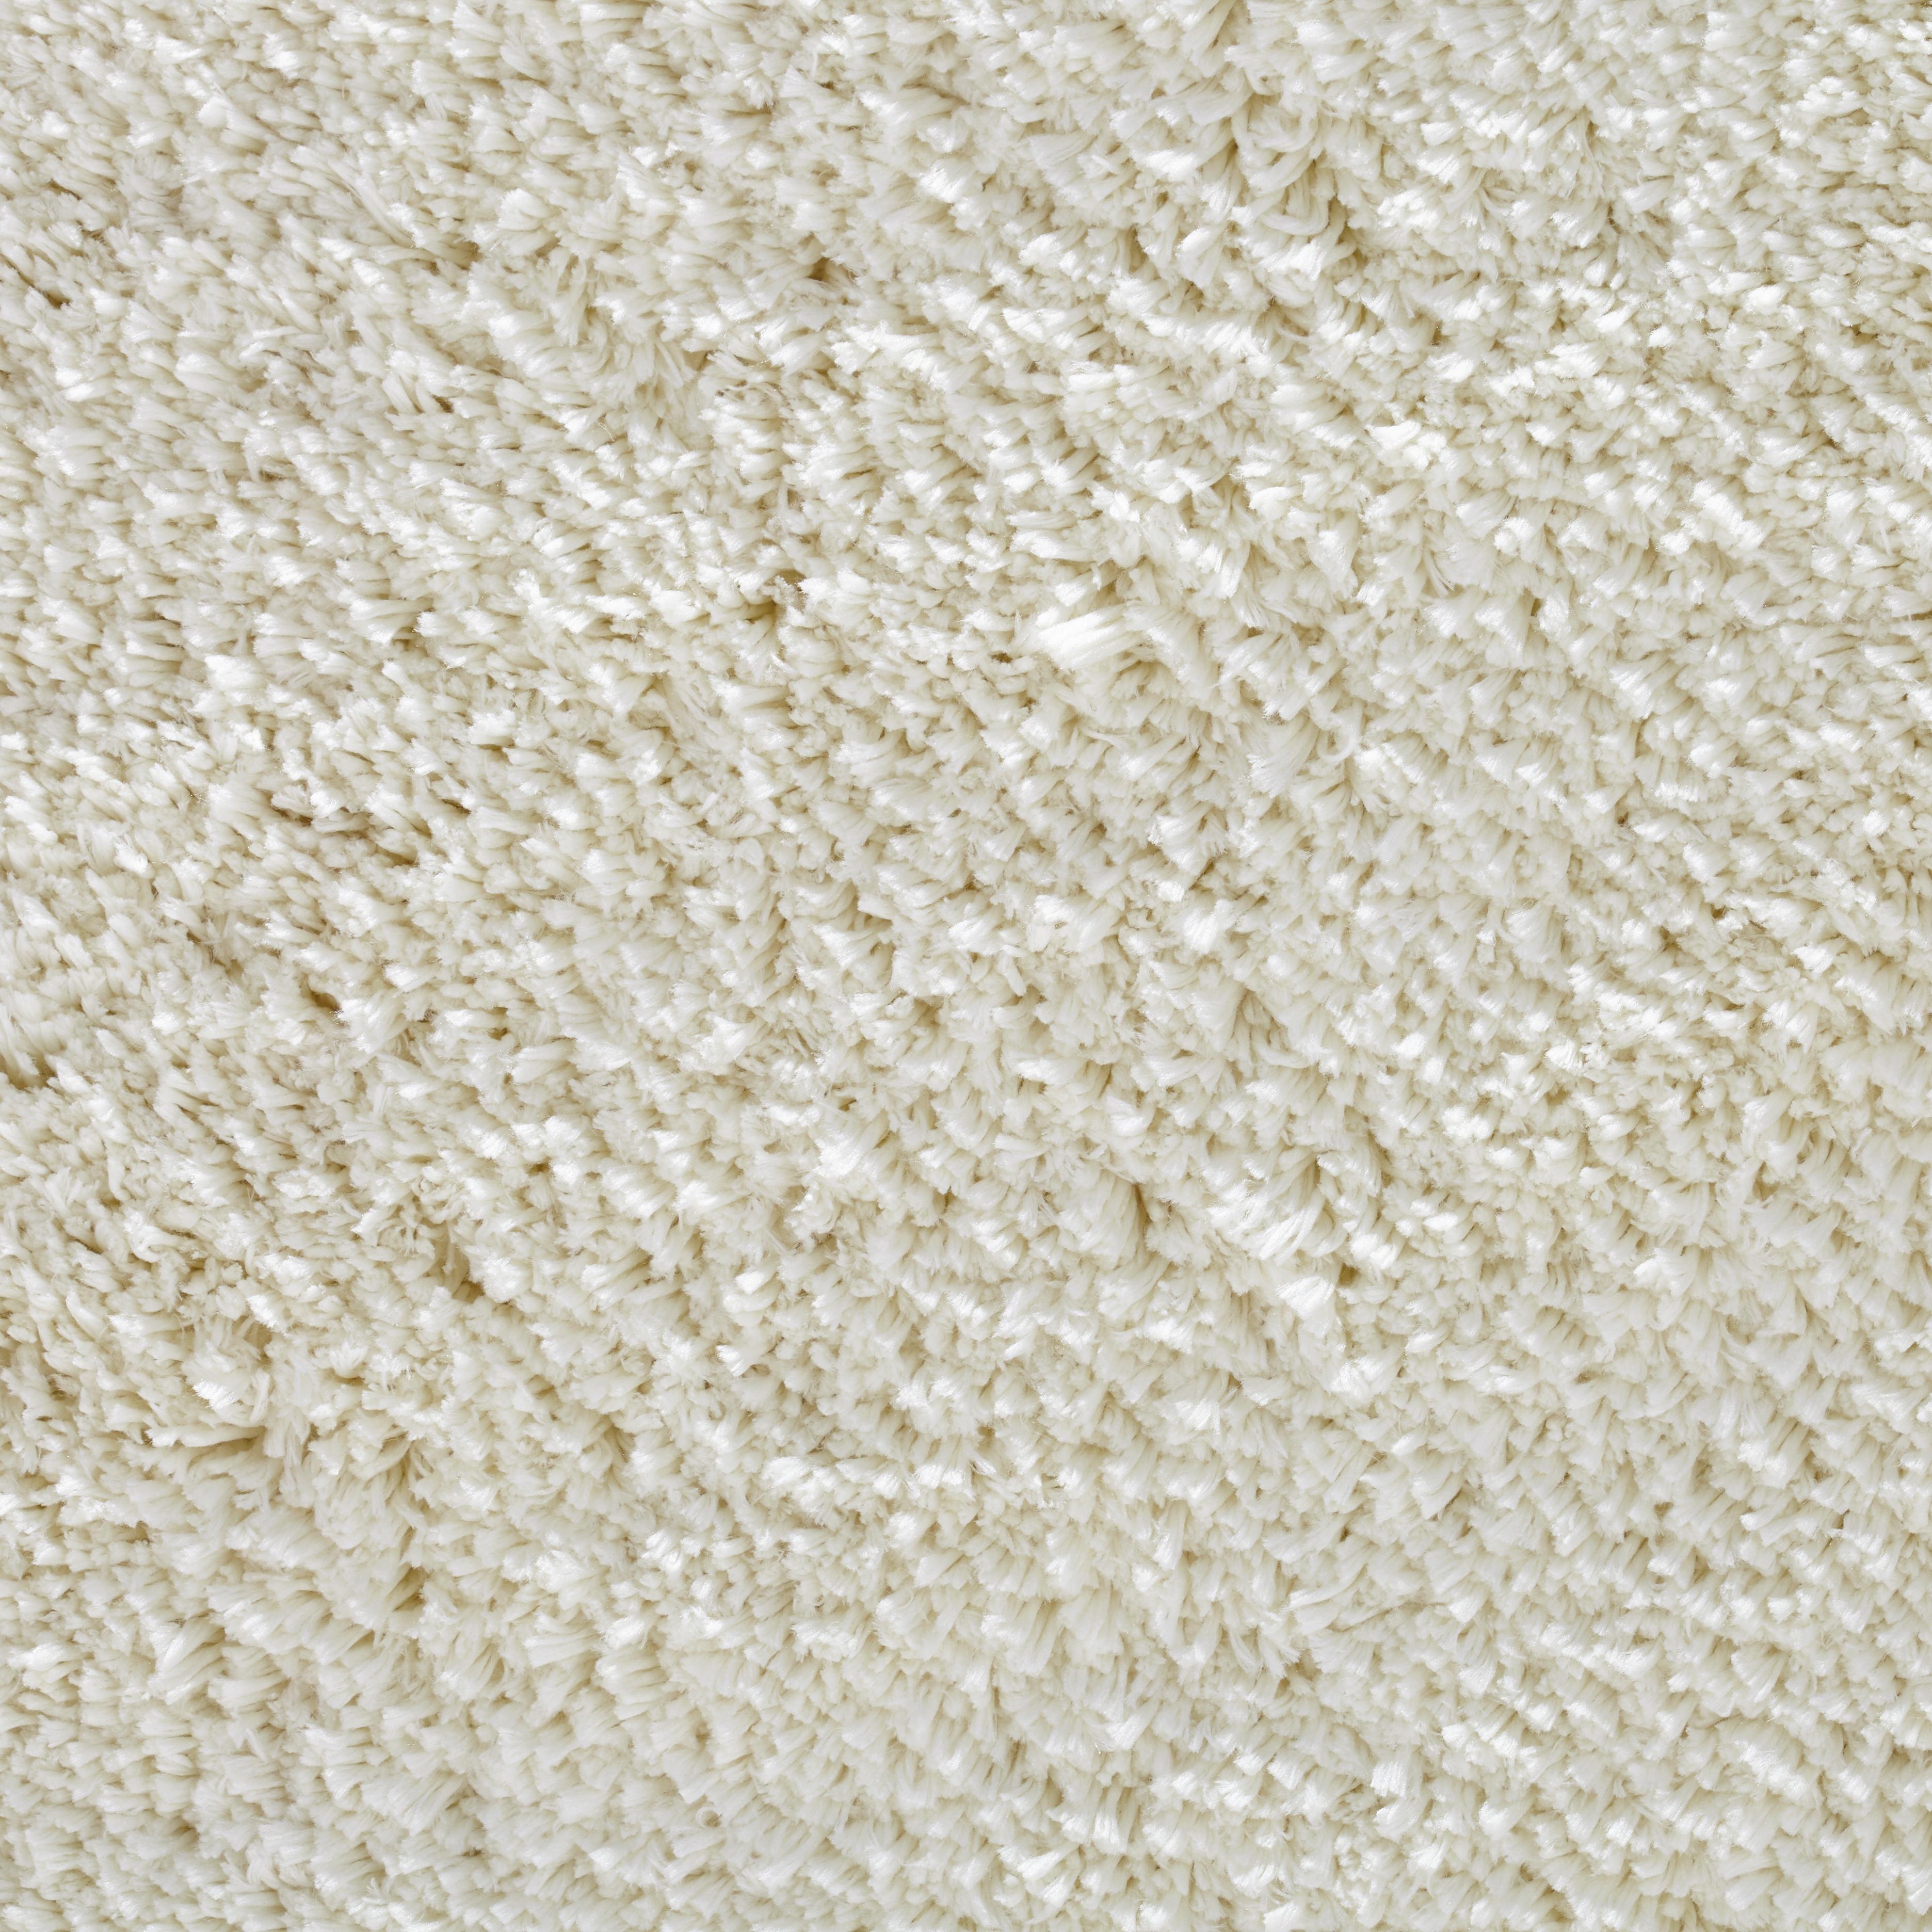 Mikrofaserbadematte Solo 50x80cm - Naturfarben, MODERN, Textil (50/80cm) - MODERN LIVING